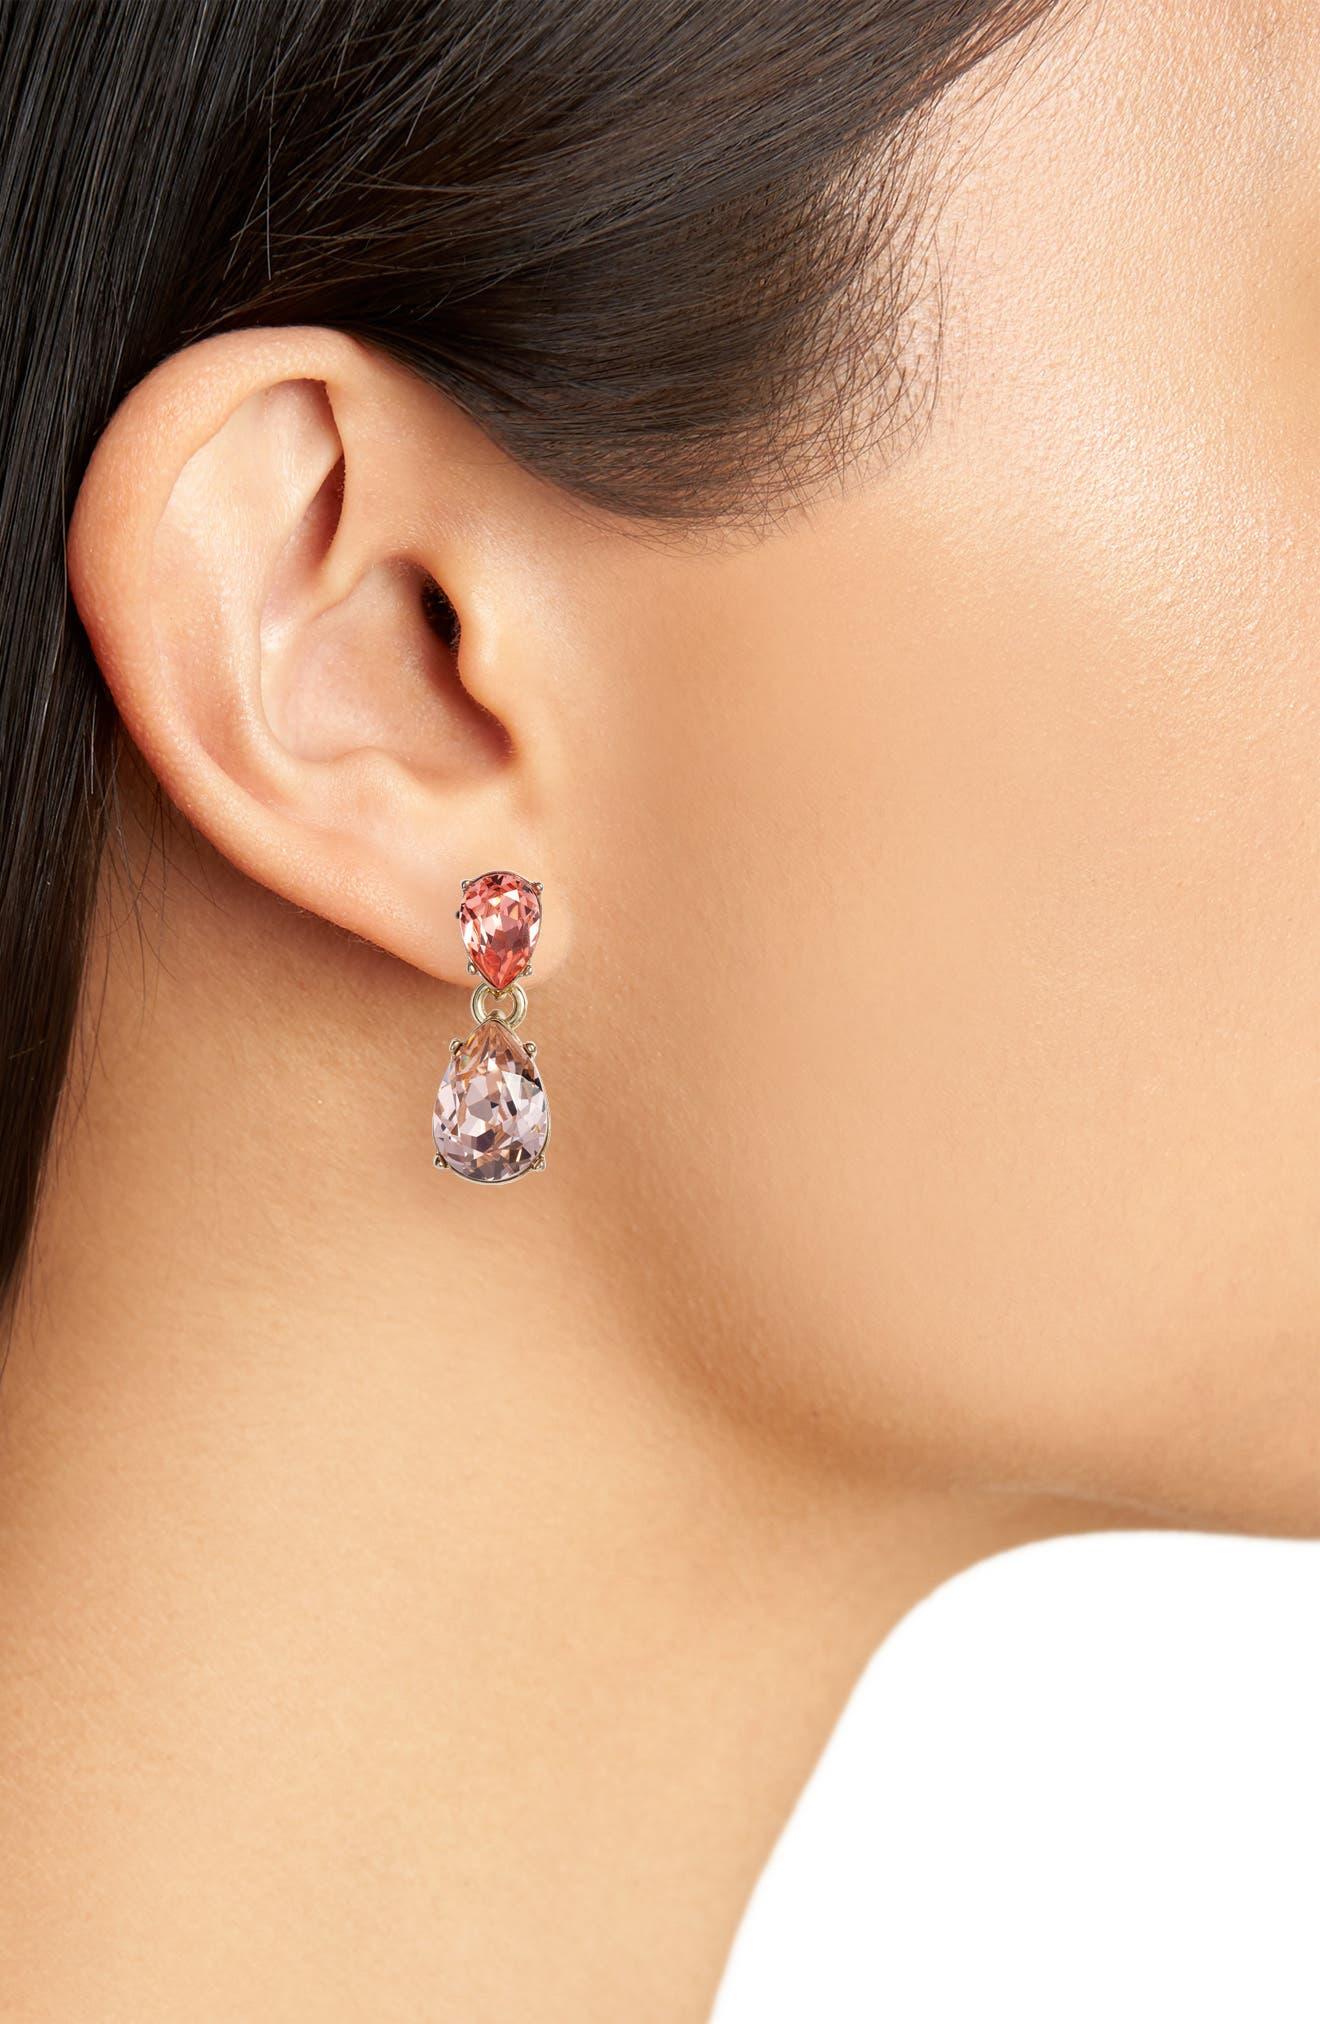 Double Pear Crystal Earrings,                             Alternate thumbnail 2, color,                             Gold/ Peach Multi